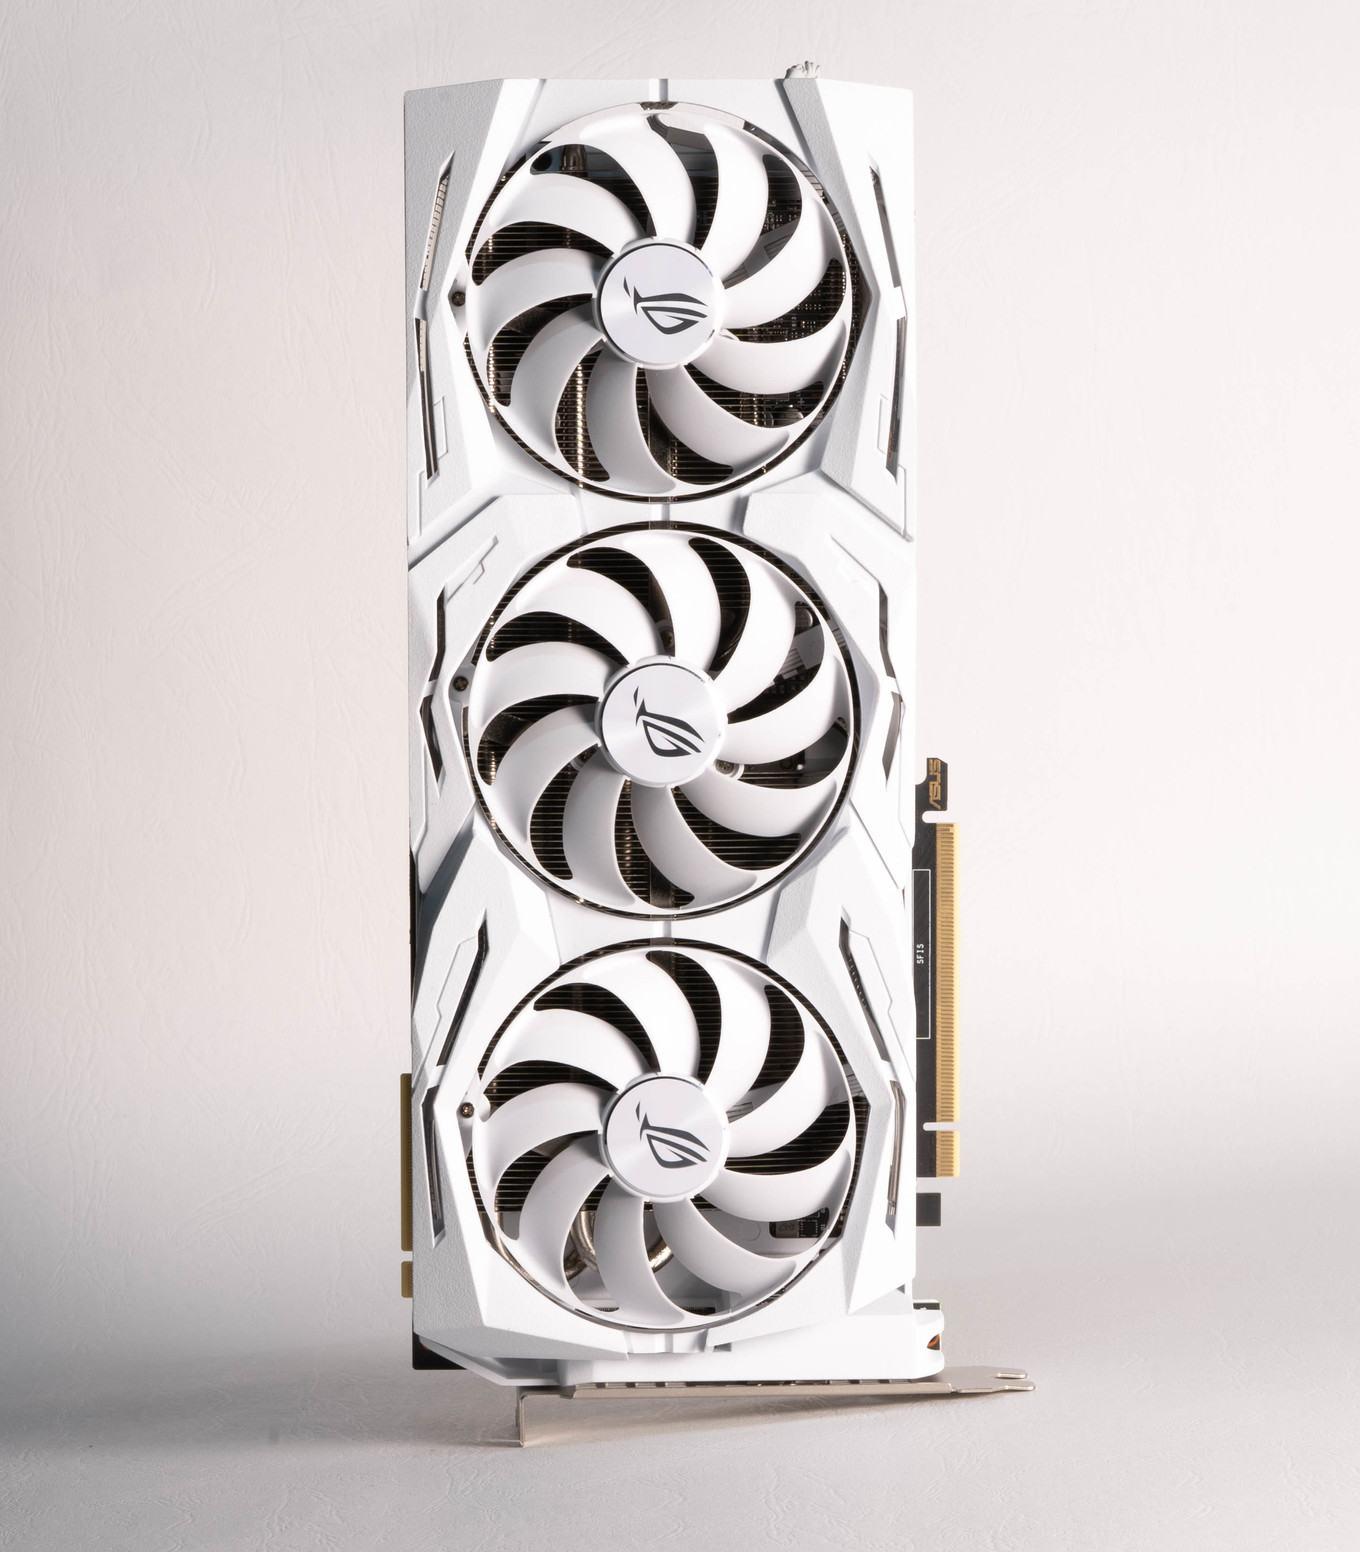 ASUS ROG Strix GeForce RTX 2080 Ti OC White Edition